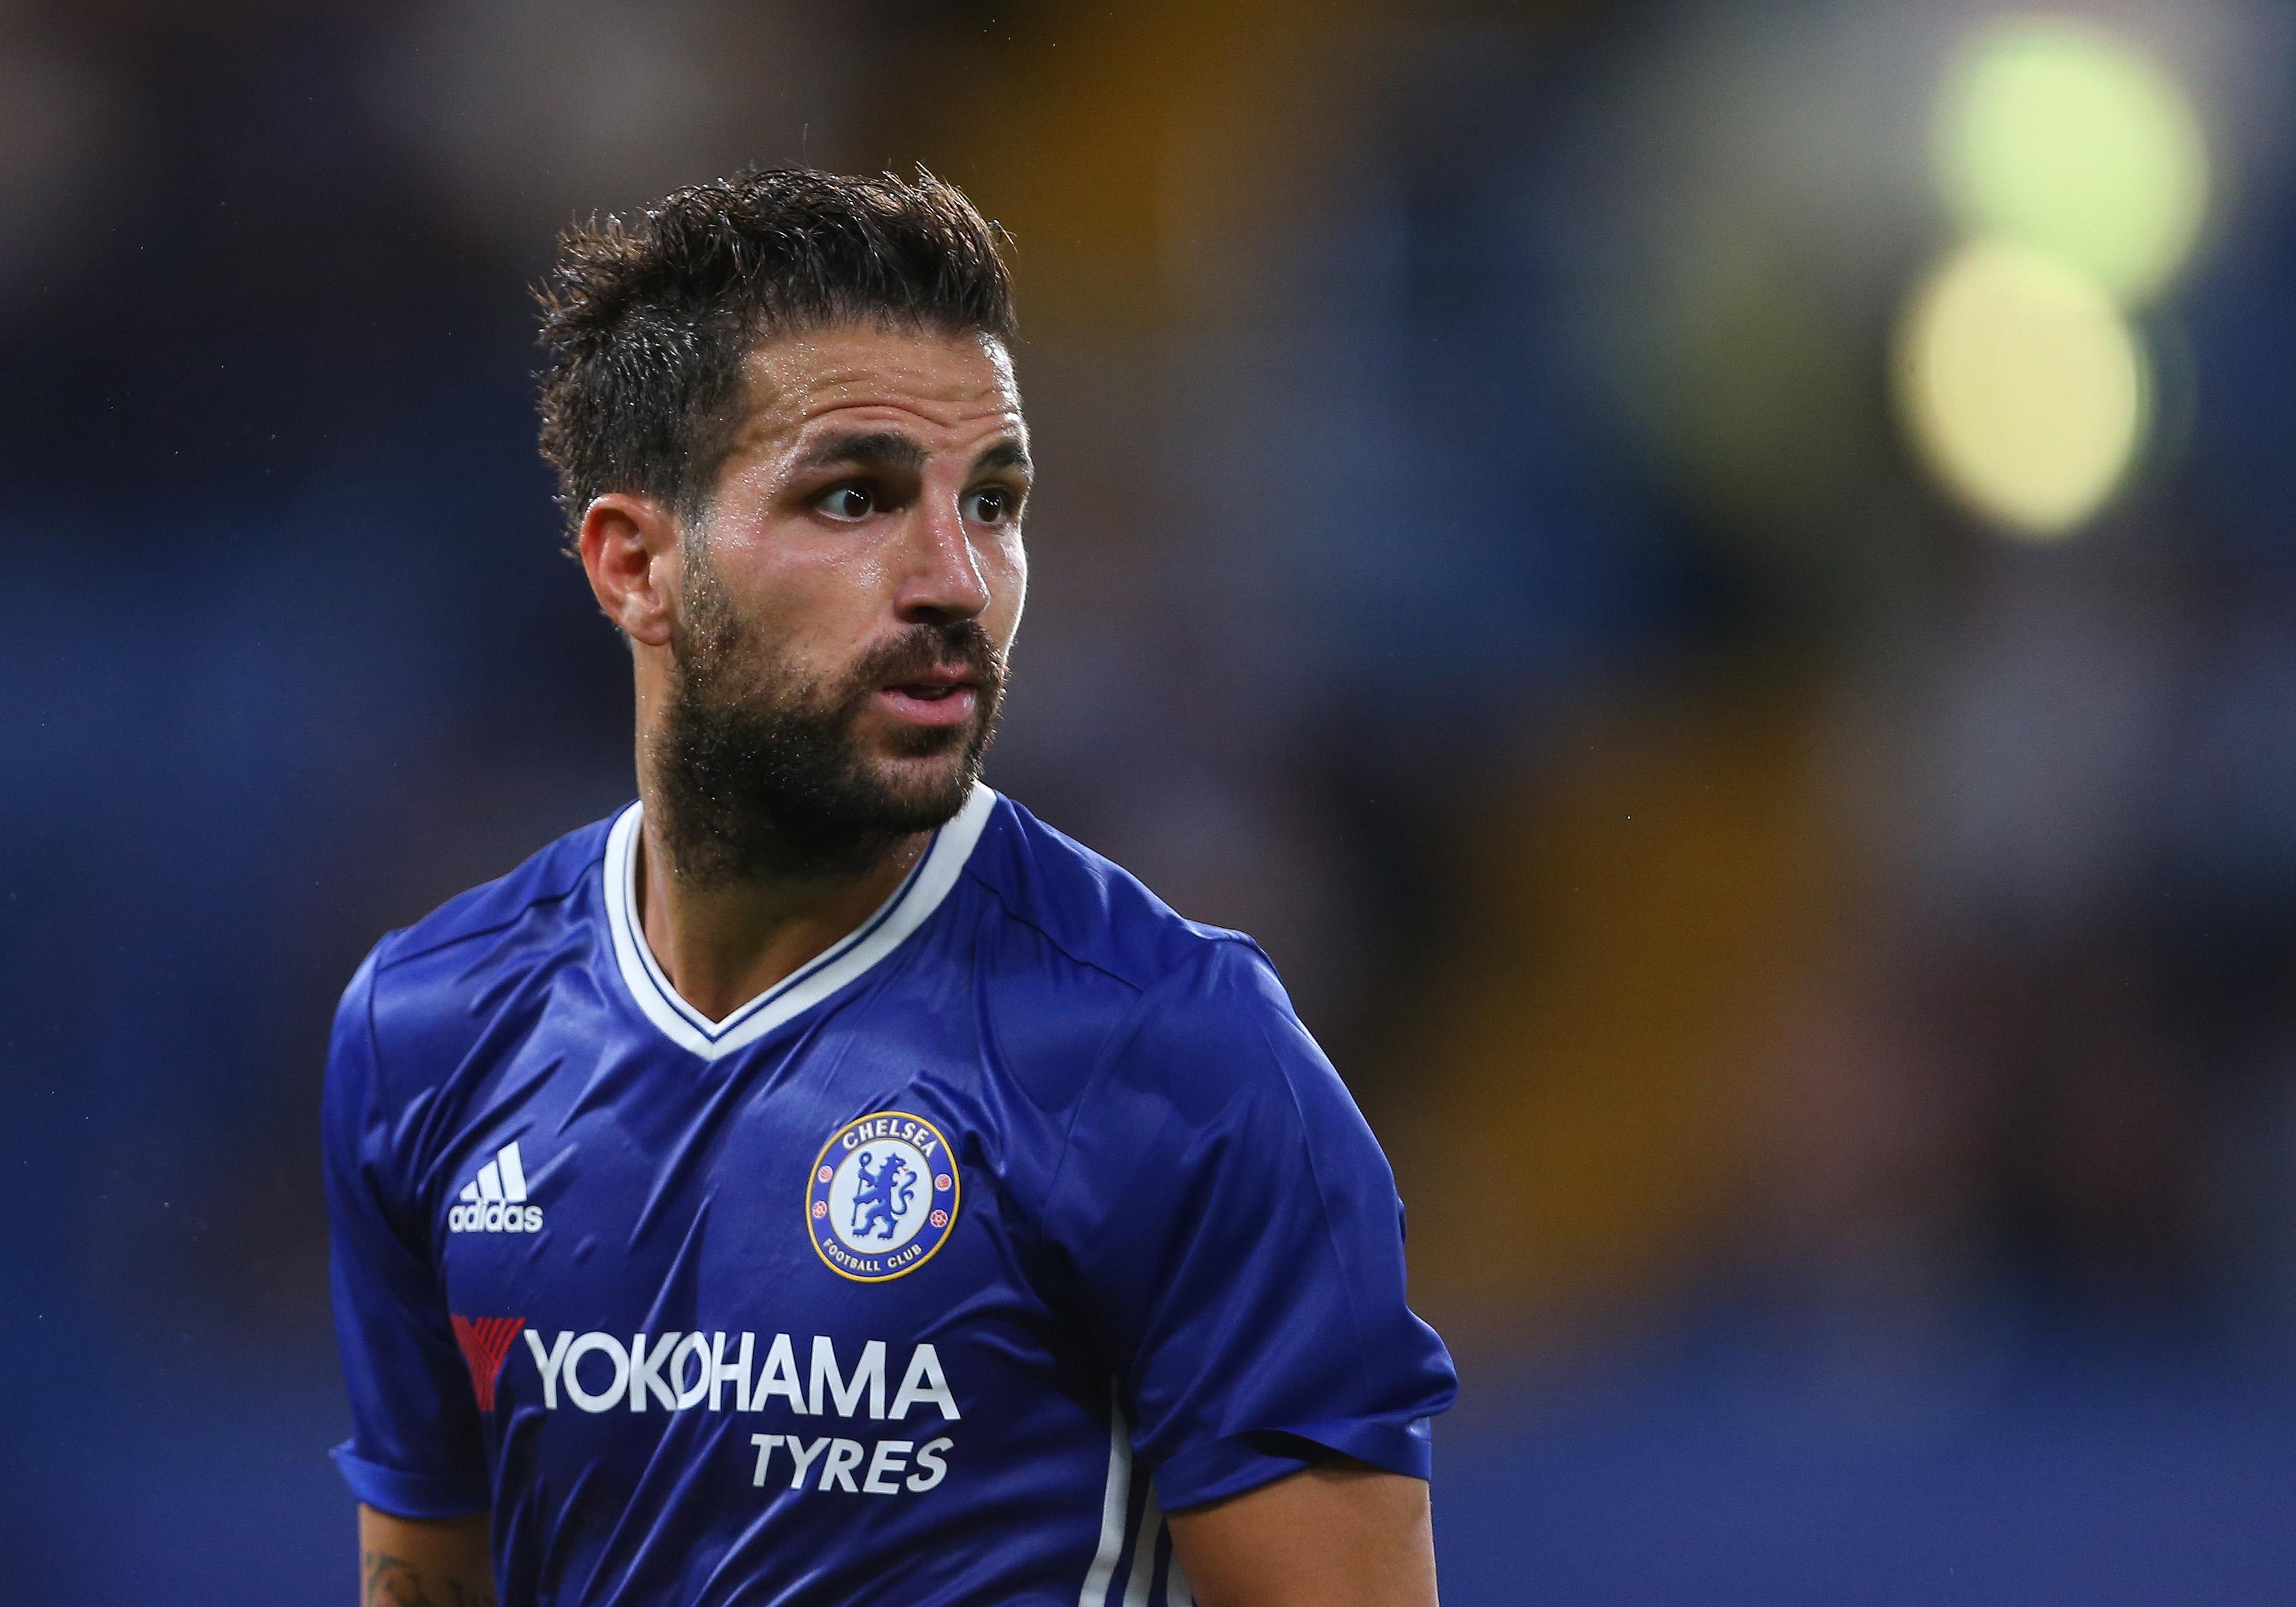 Chelsea duo Cesc Fabregas and Branislav Ivanovic set to miss Leicester City clash